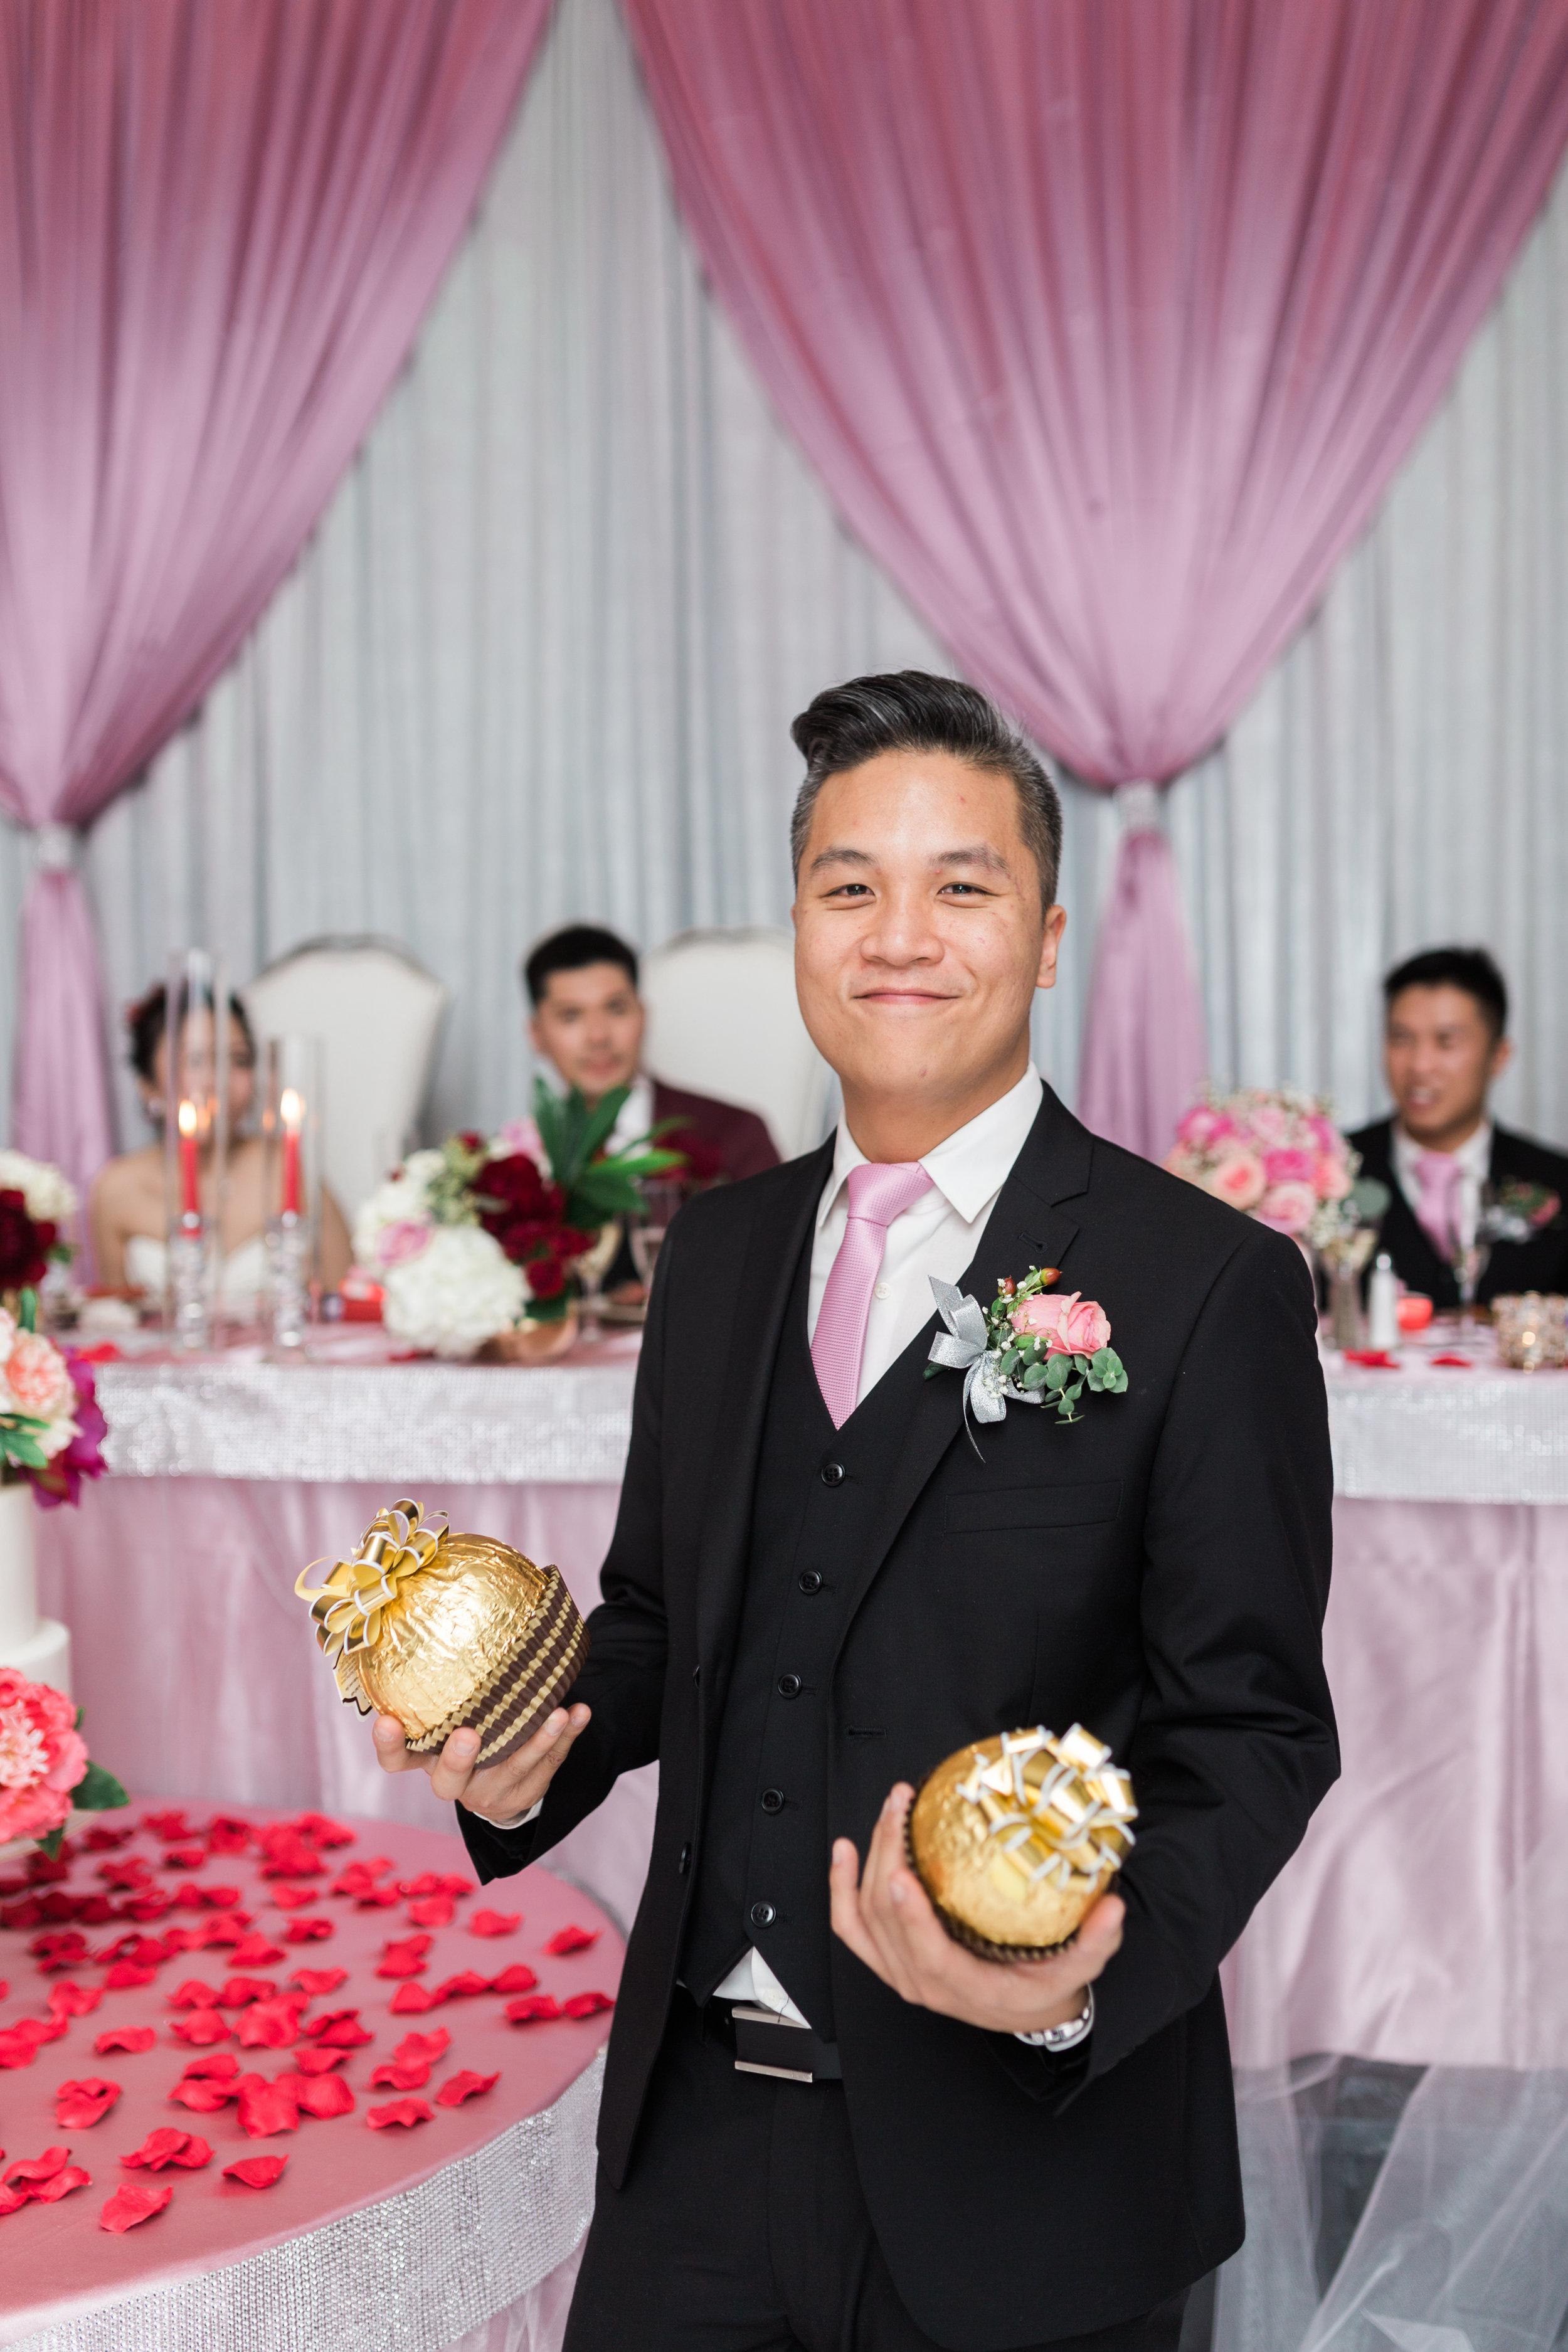 Parkview Manor Wedding - Reception-124.jpg